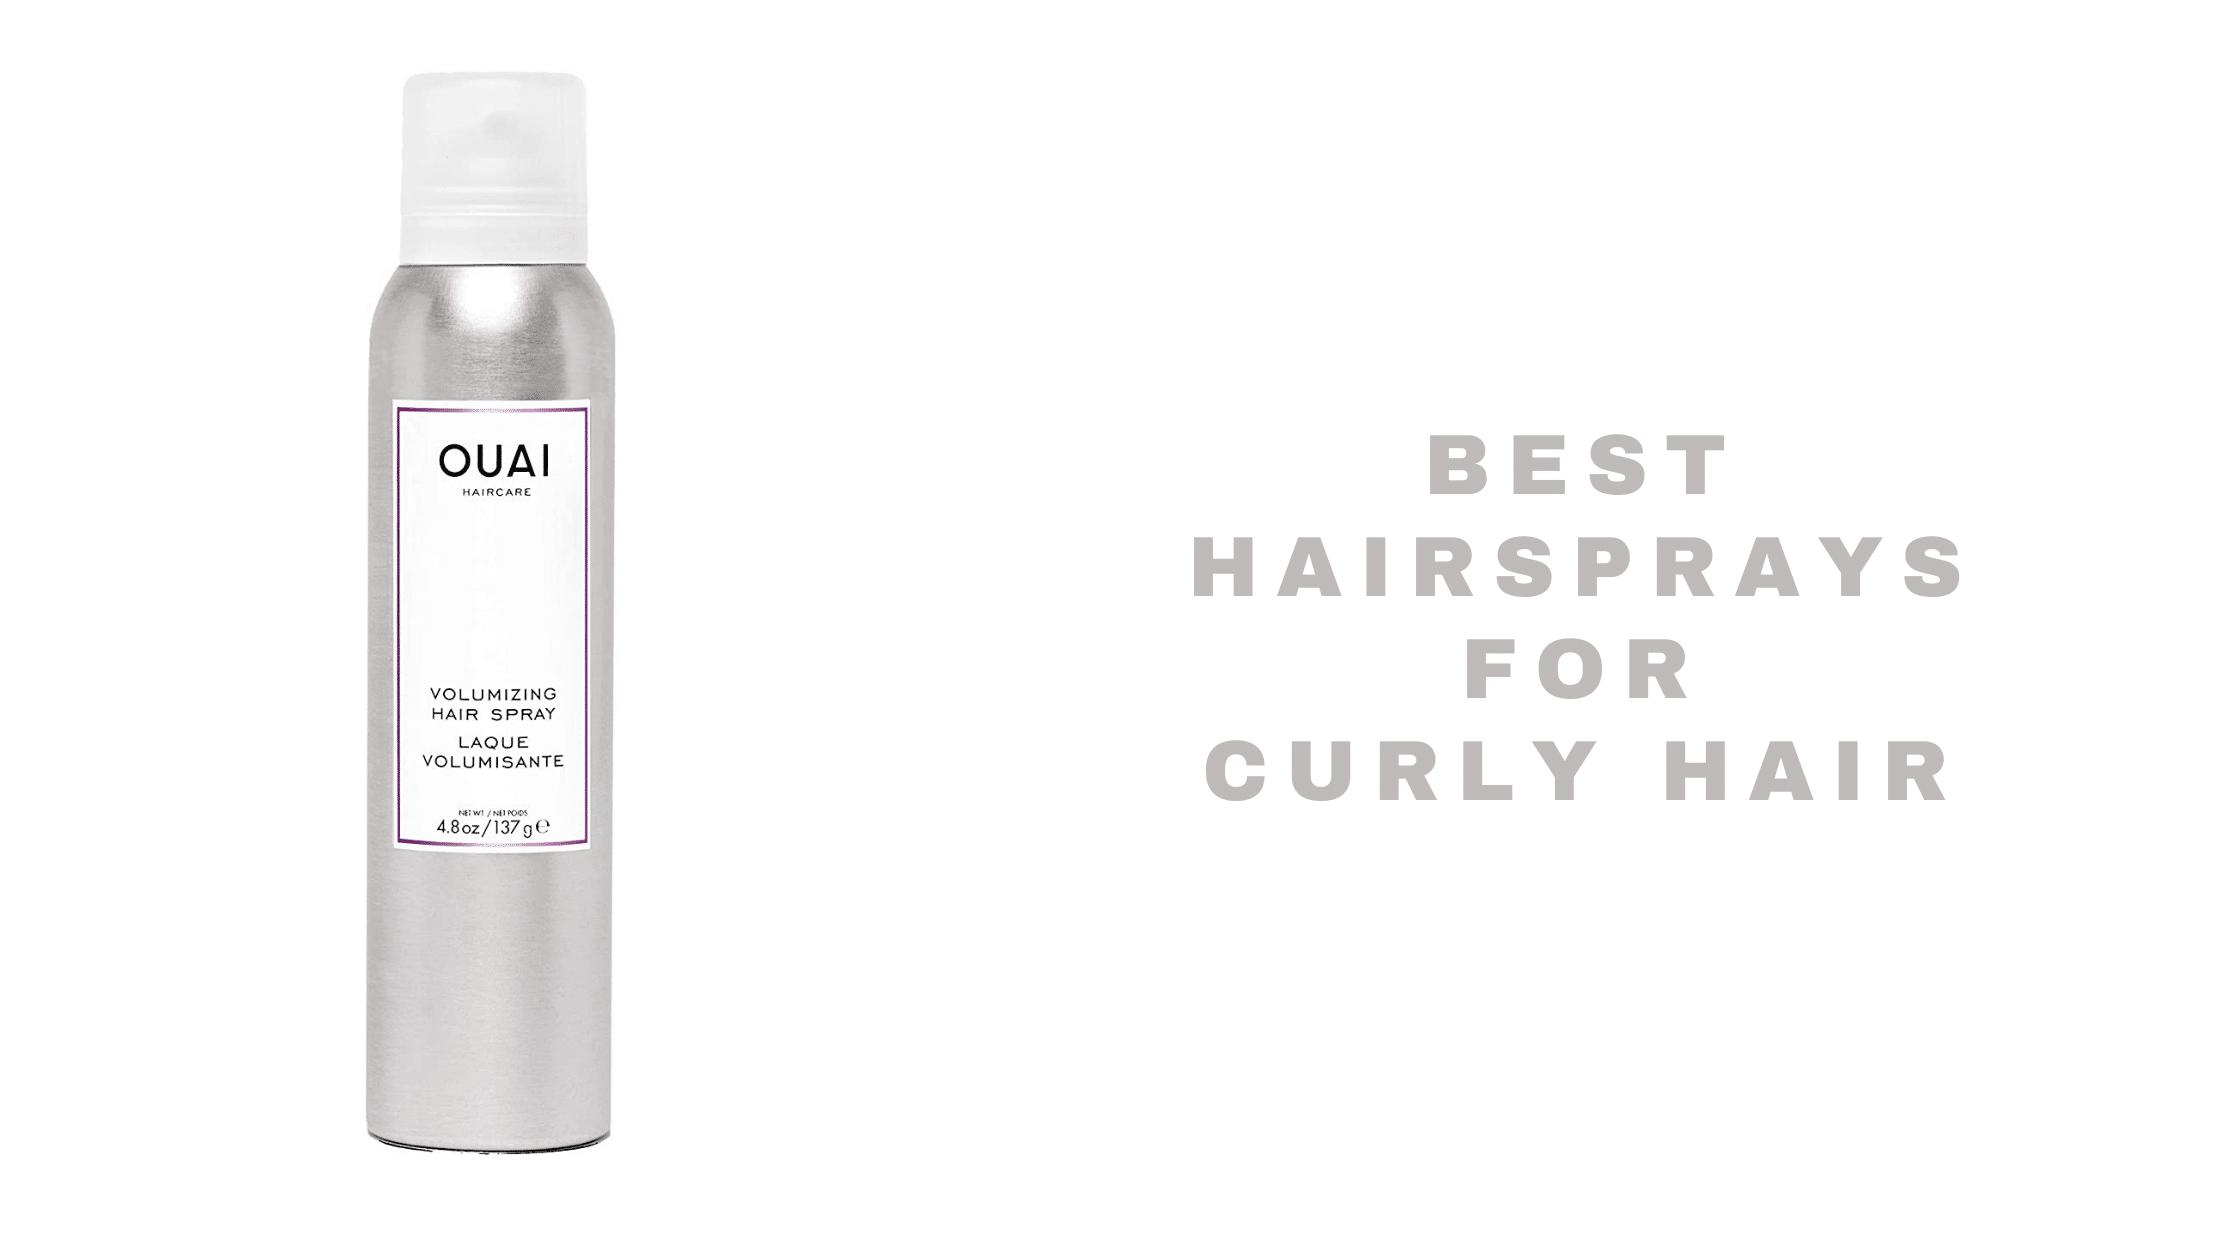 10 Best Hairsprays for Curly Hair 2021